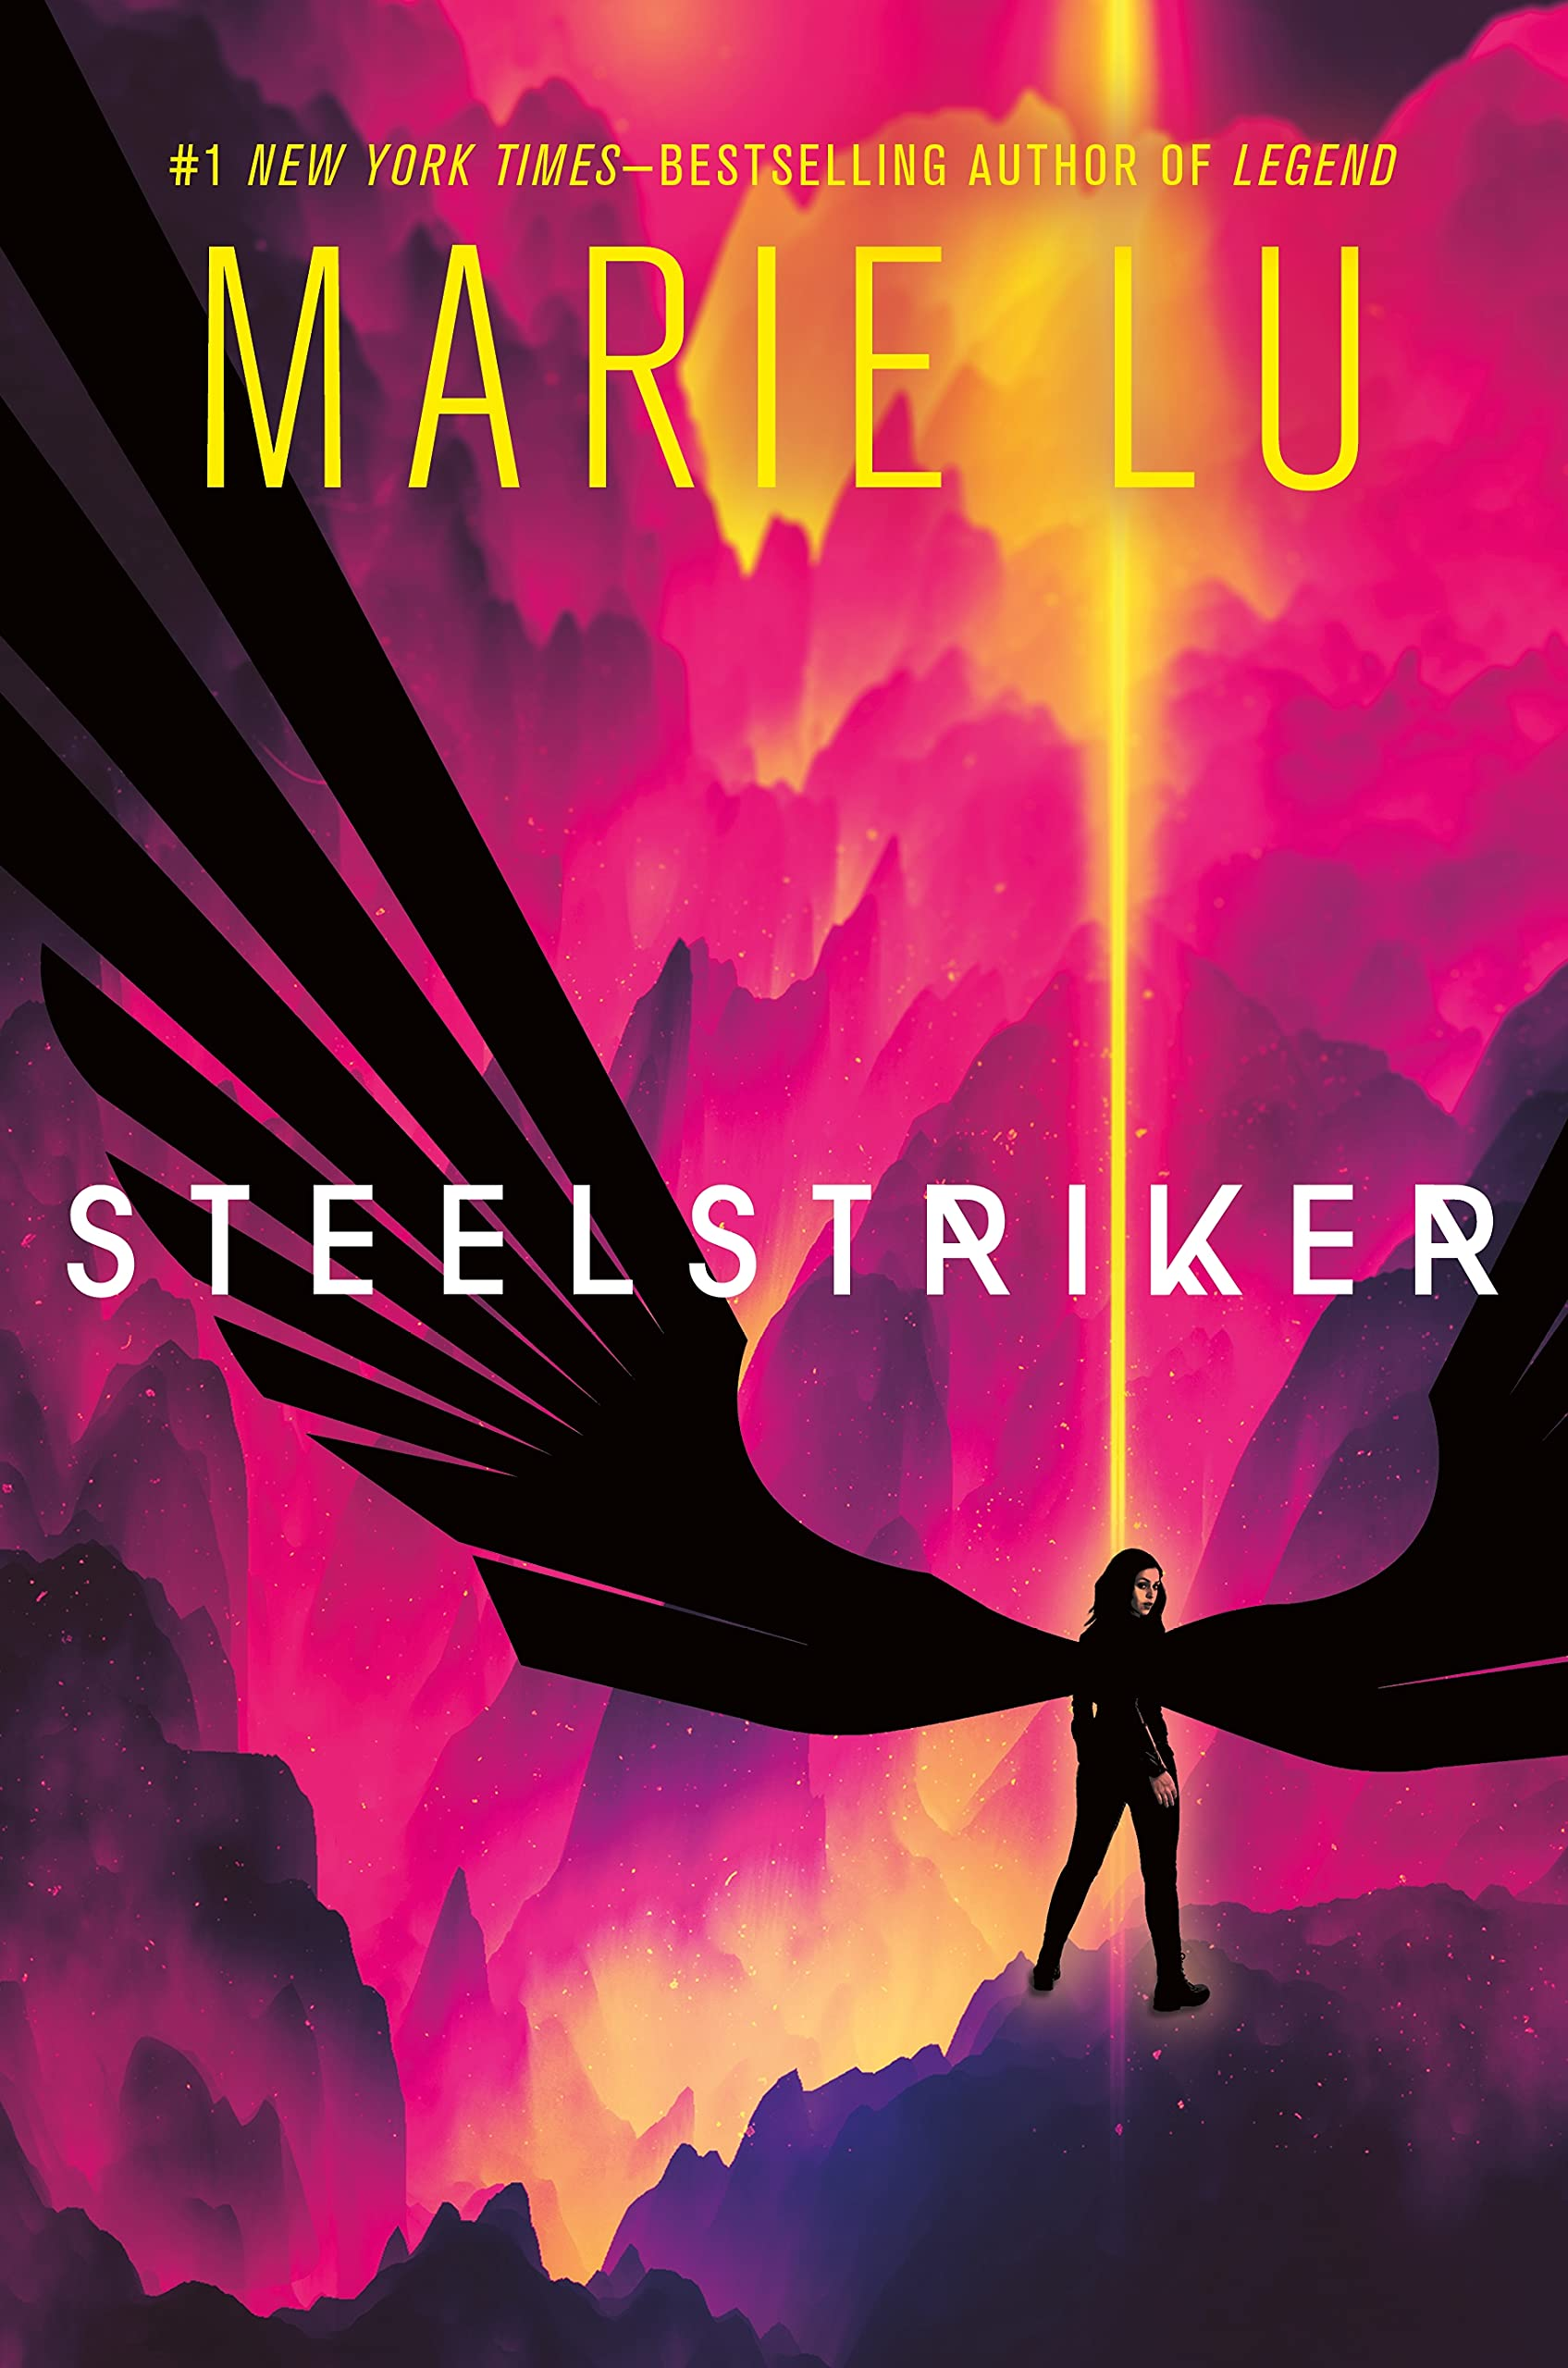 Amazon.com: Steelstriker (Skyhunter Duology): 9781250221728: Lu, Marie:  Books